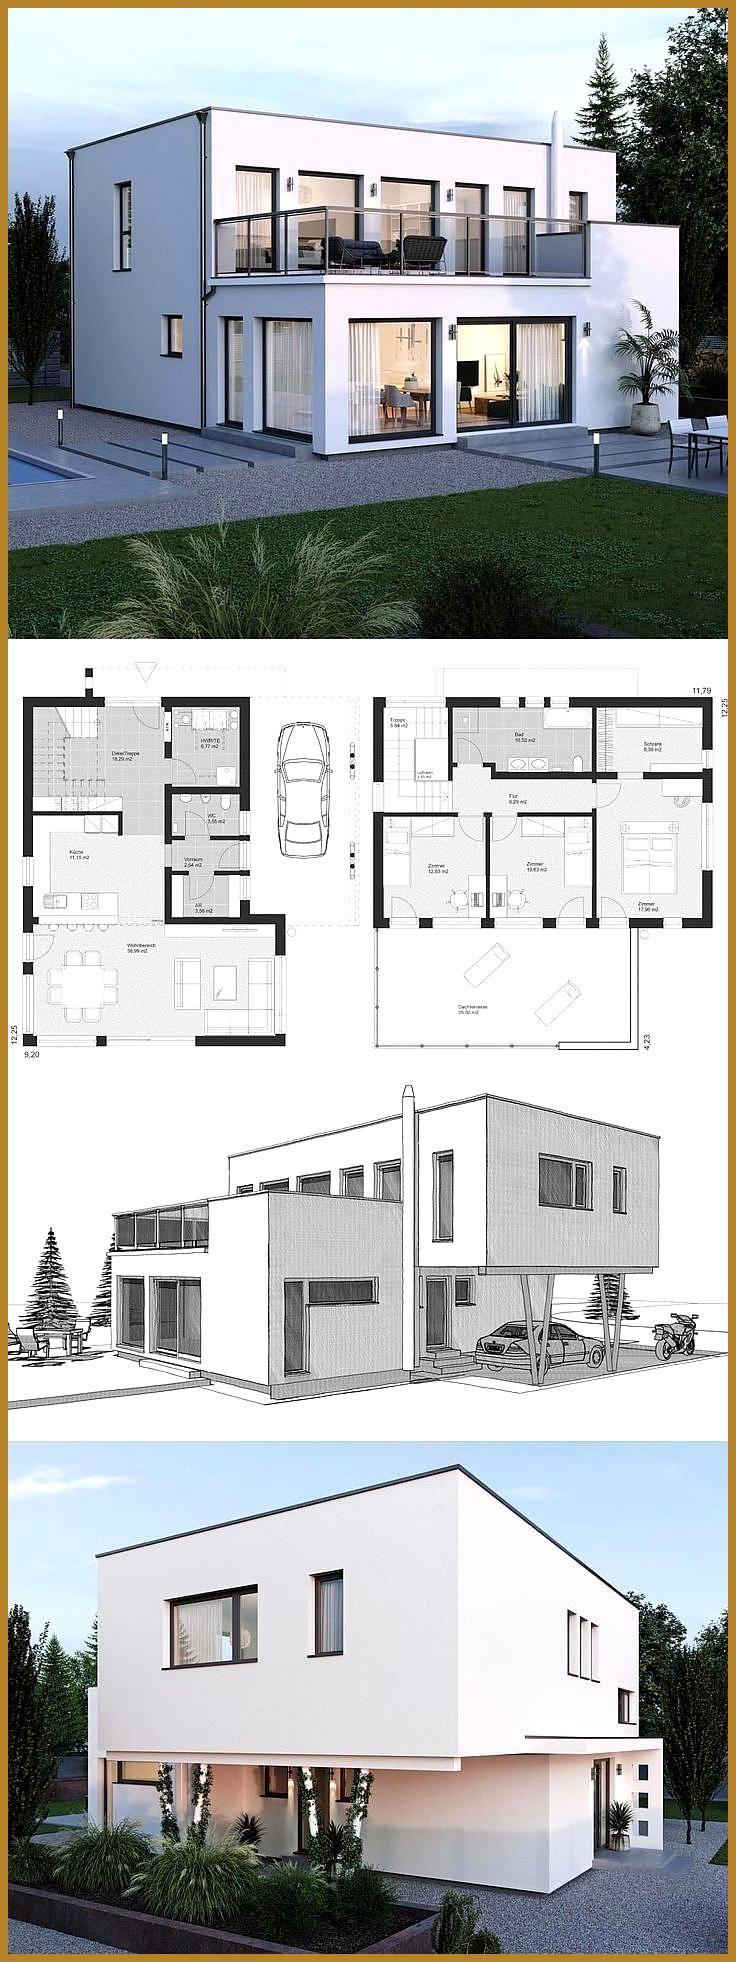 Modern Villa Minimalist Style Architecture Design House Plans ELK Haus 164  Drea…